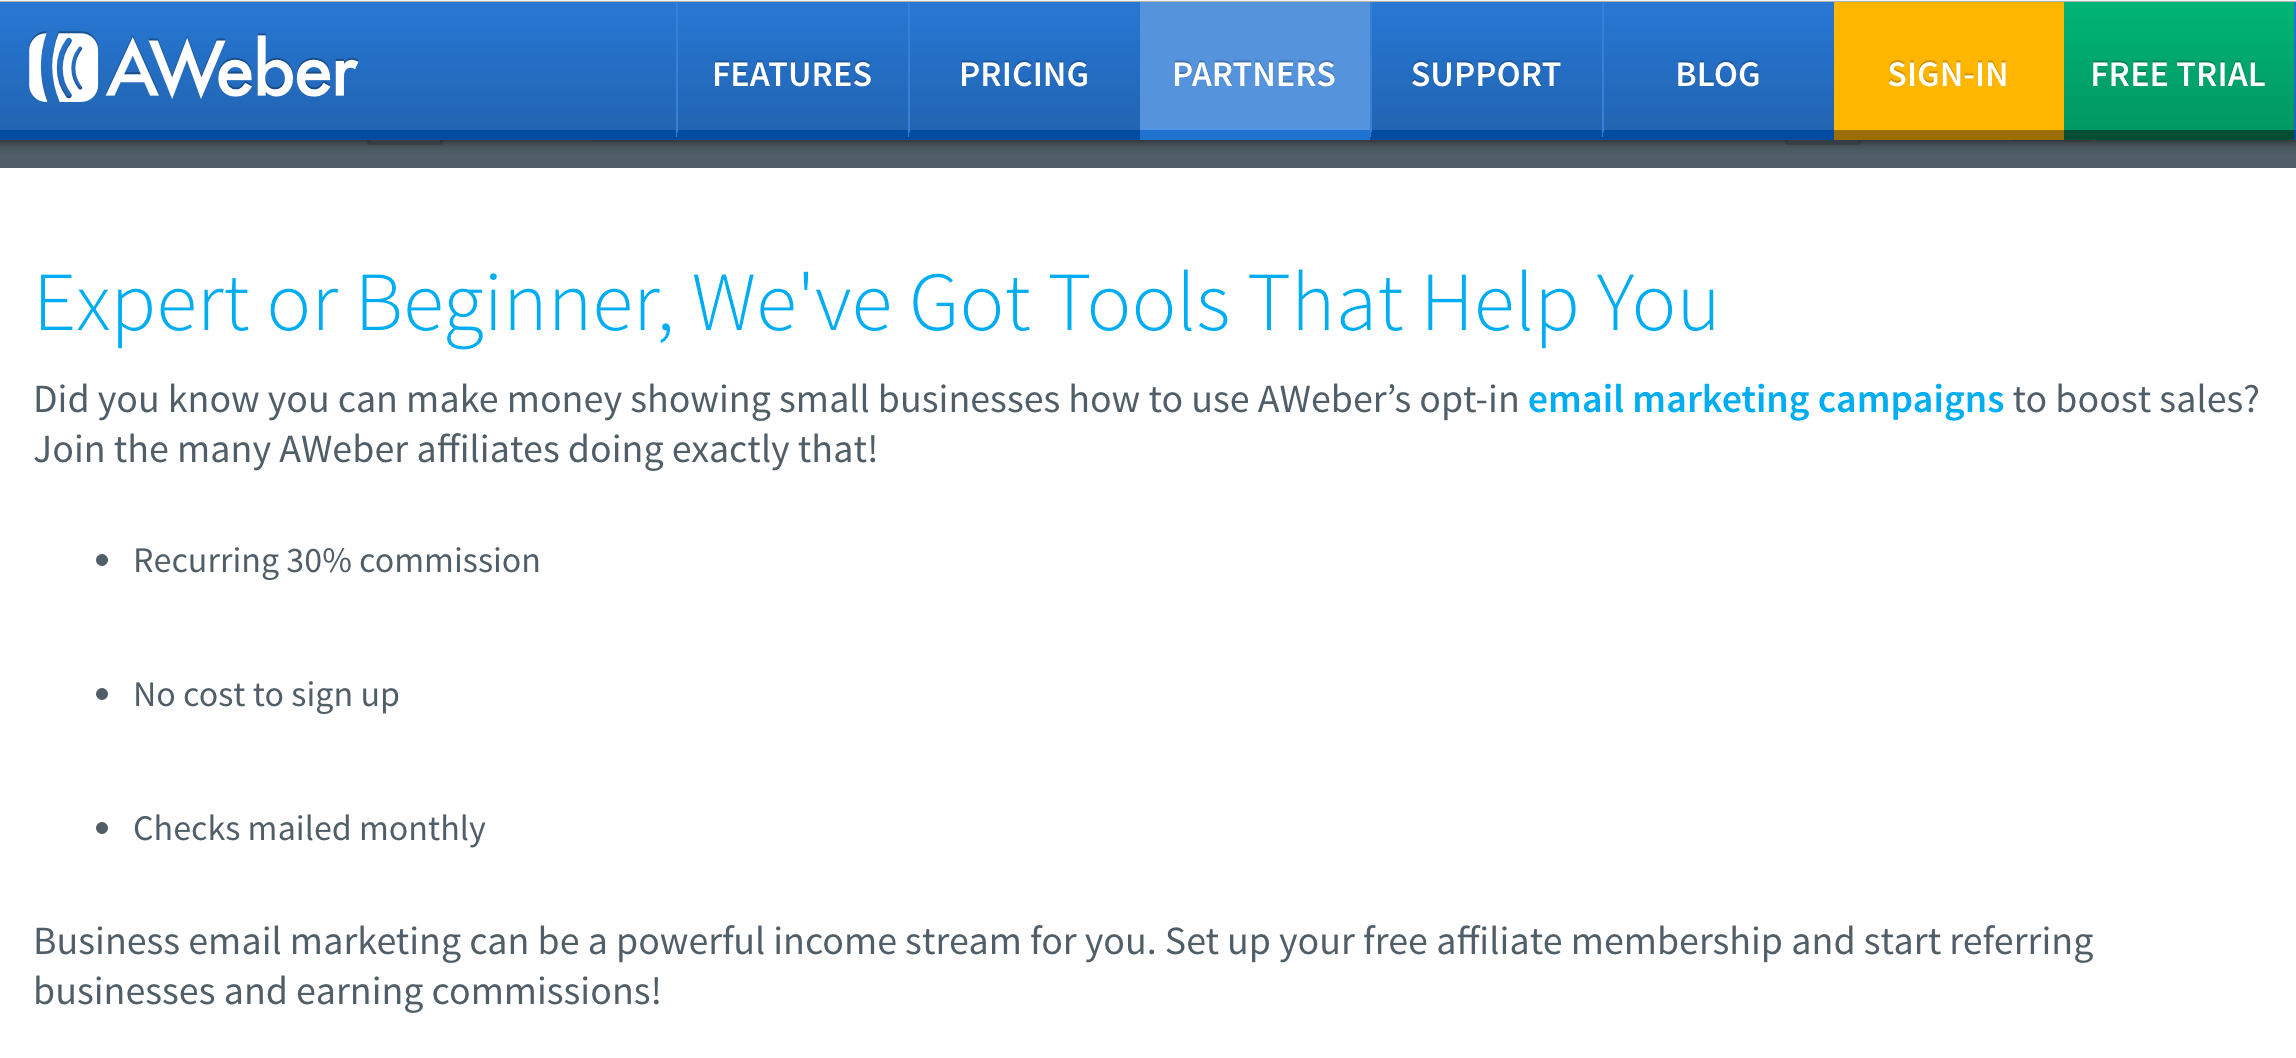 Aweber - Email Marketing Affiliate Programs